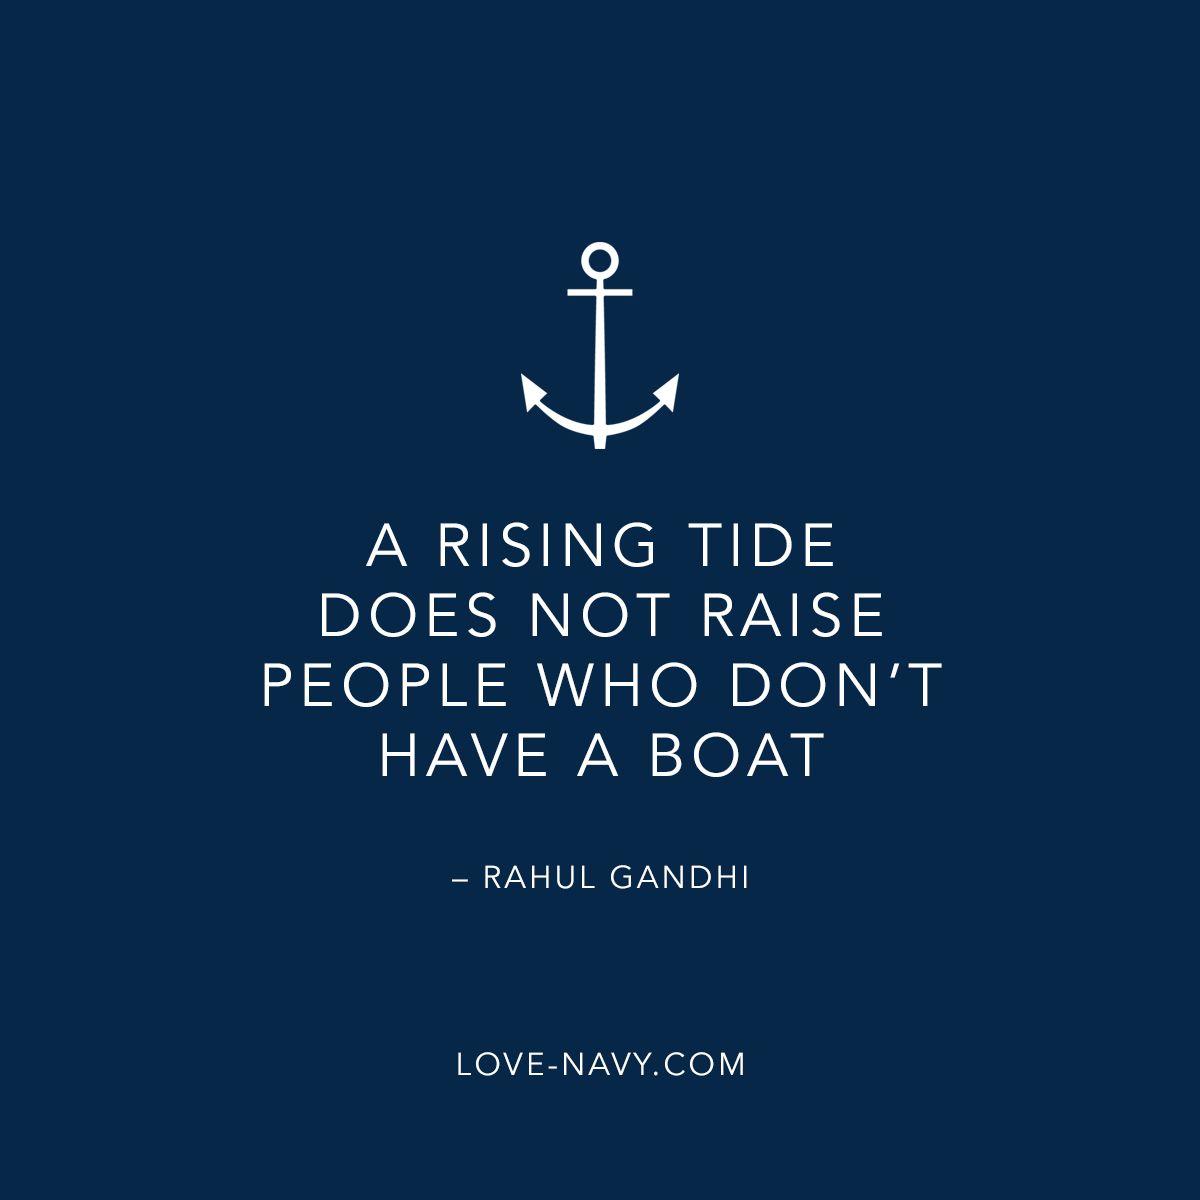 Gandhi Quotes On Love Gandhi Quotes Lovenavy  Navy Quotes  Pinterest  Navy